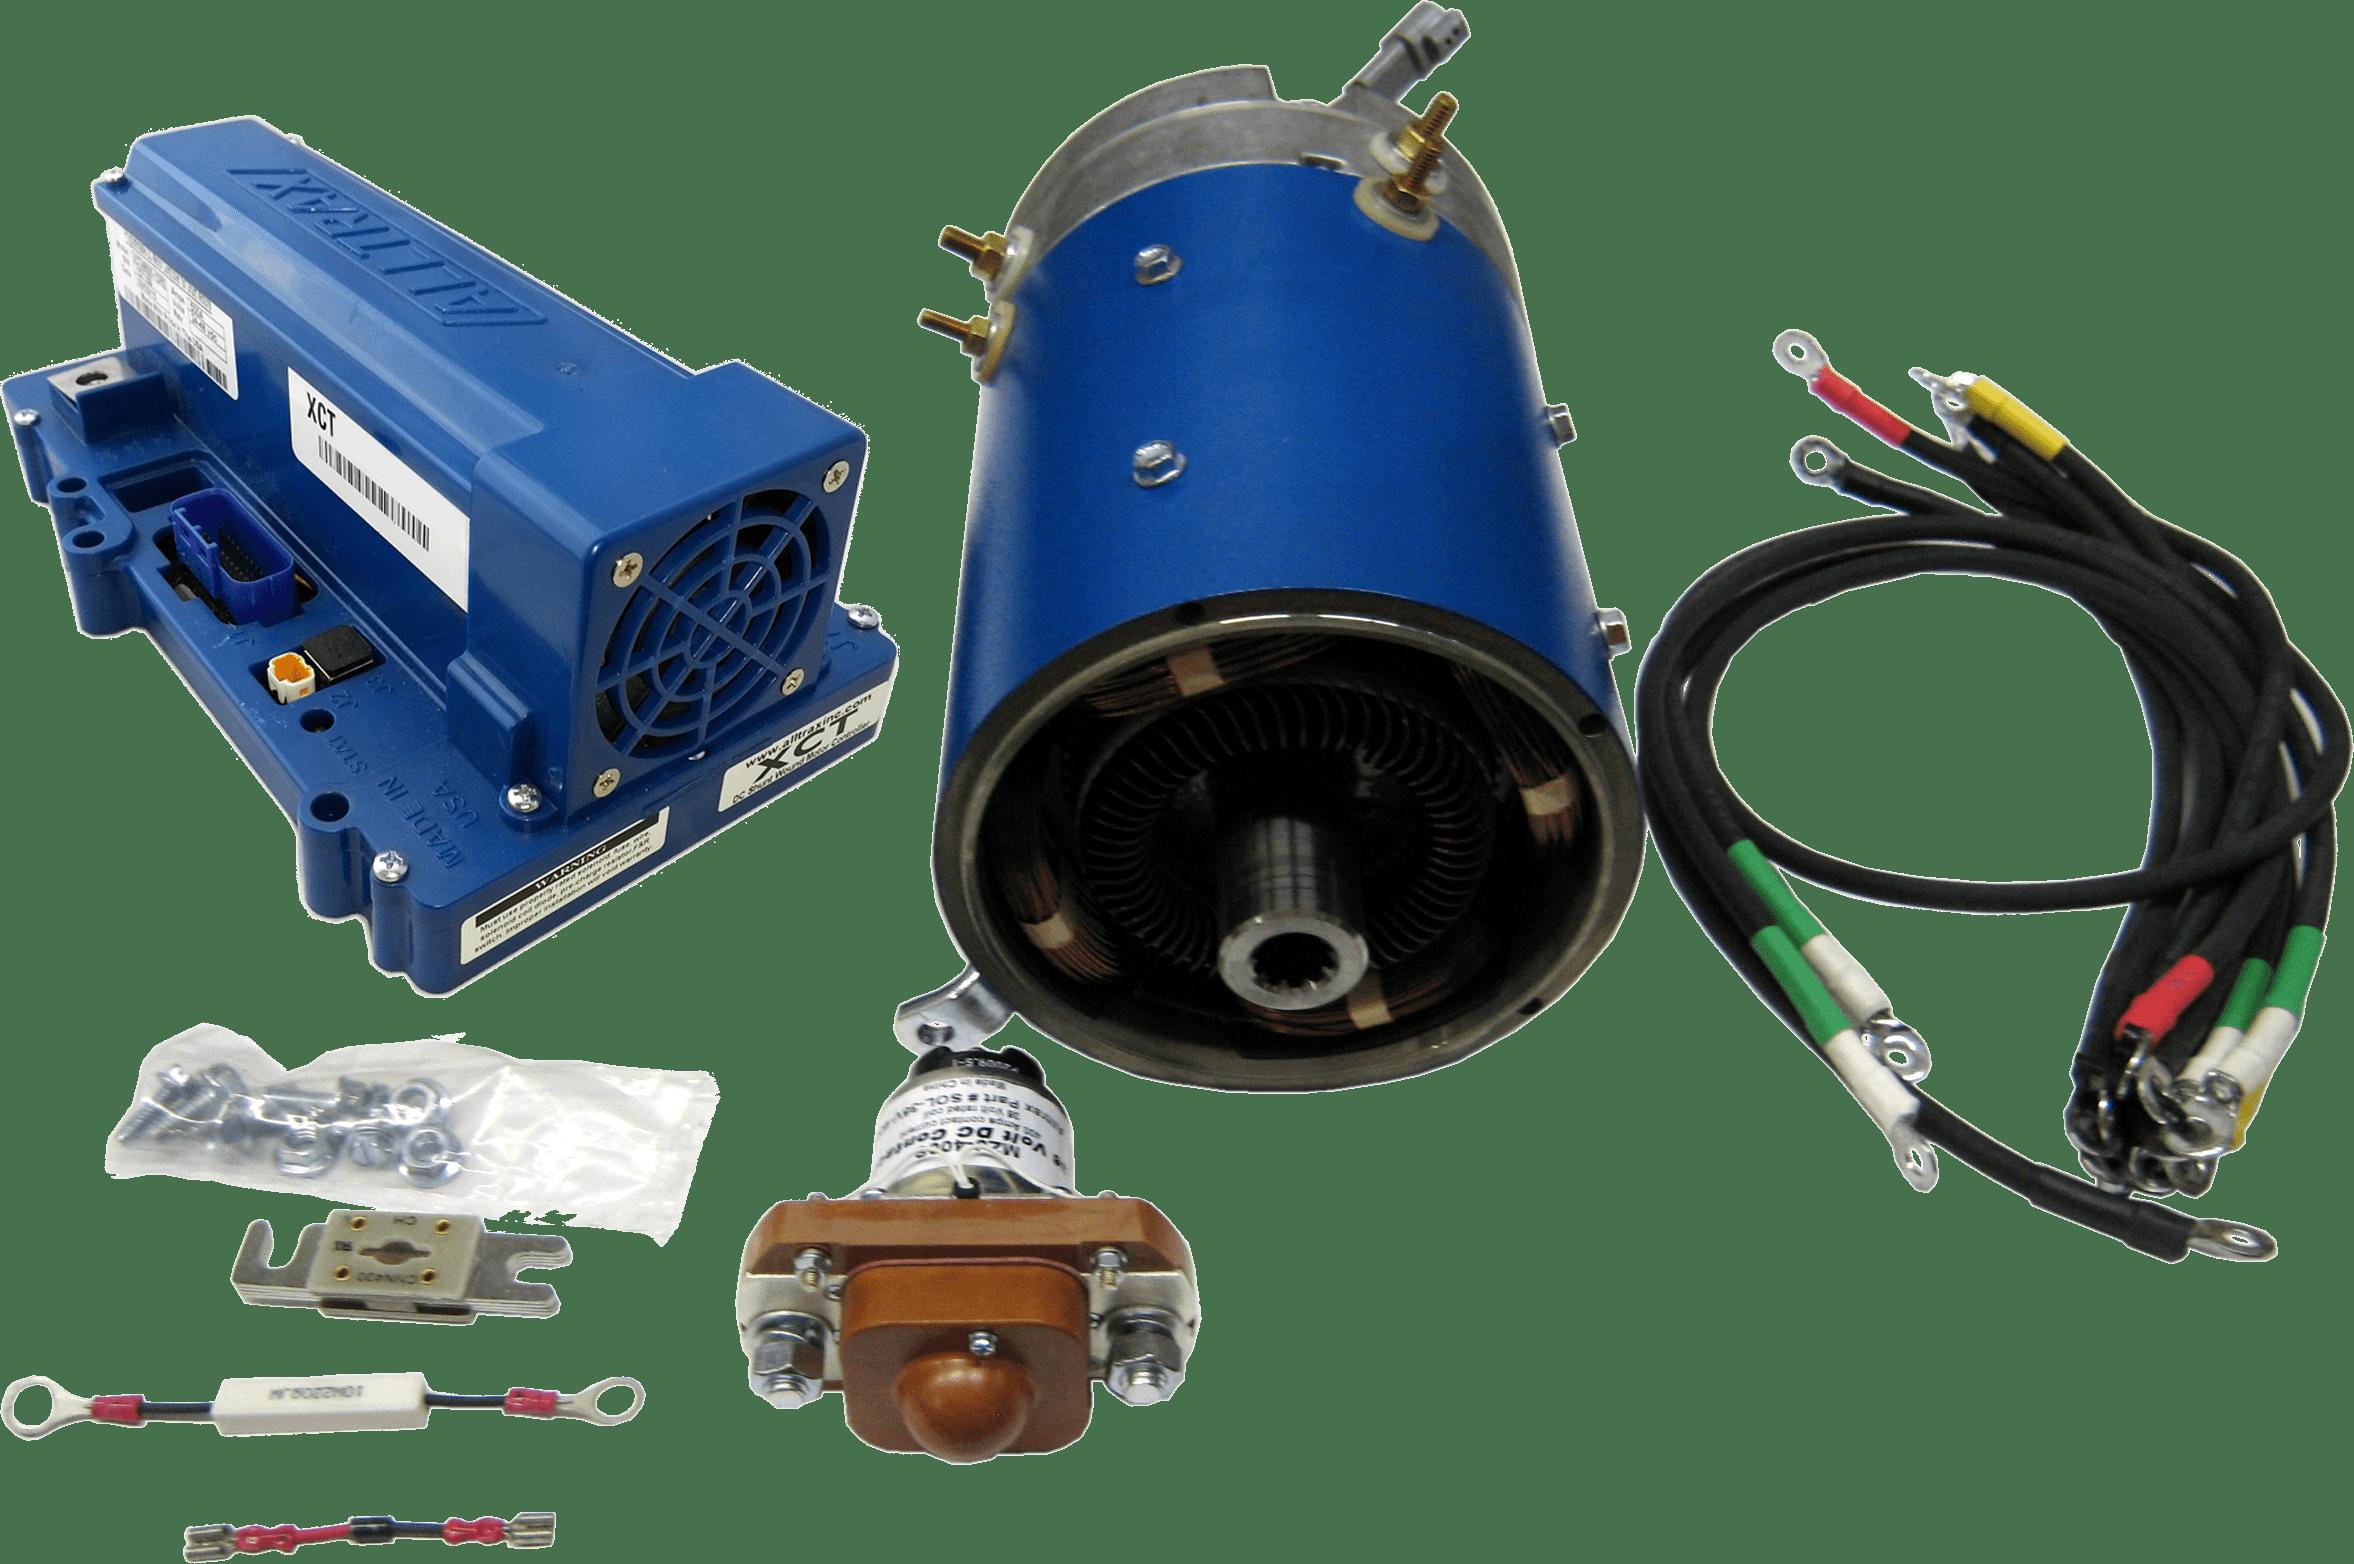 Gas Ezgo Solenoid Wiring Diagram Yamaha Golf Cart Electric Motor Upgrades High Speed